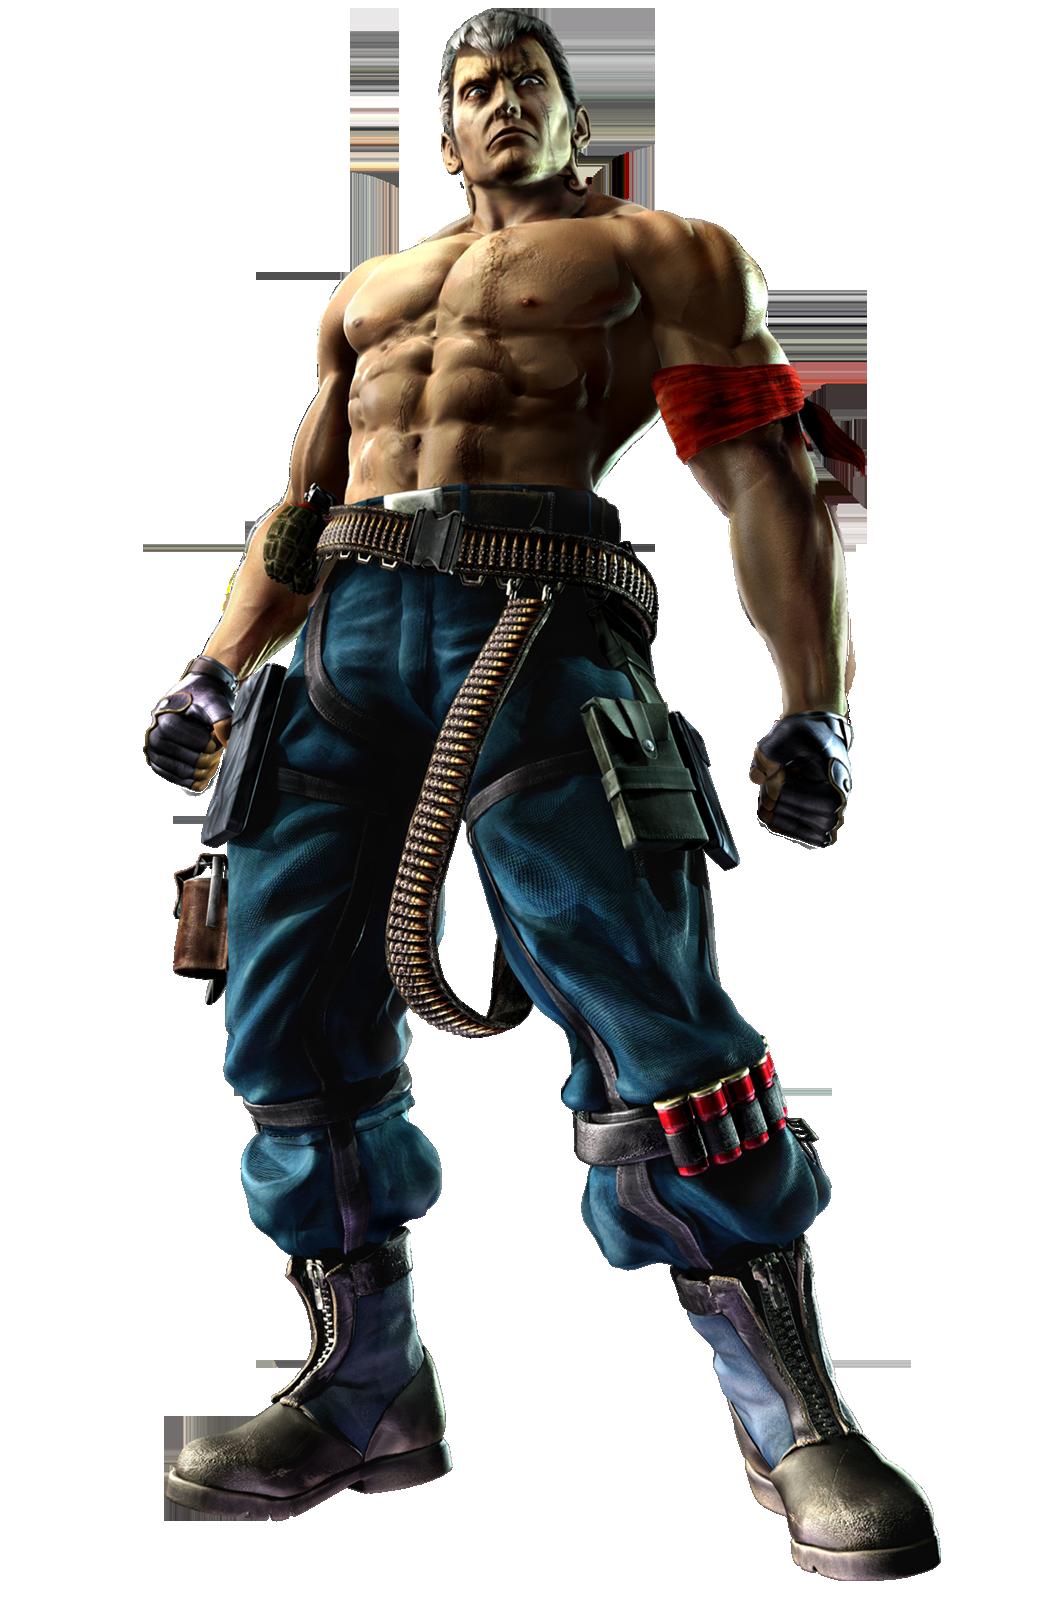 File:180px-Bryan Fury - Full-body CG Art Image - Tekken 6.png